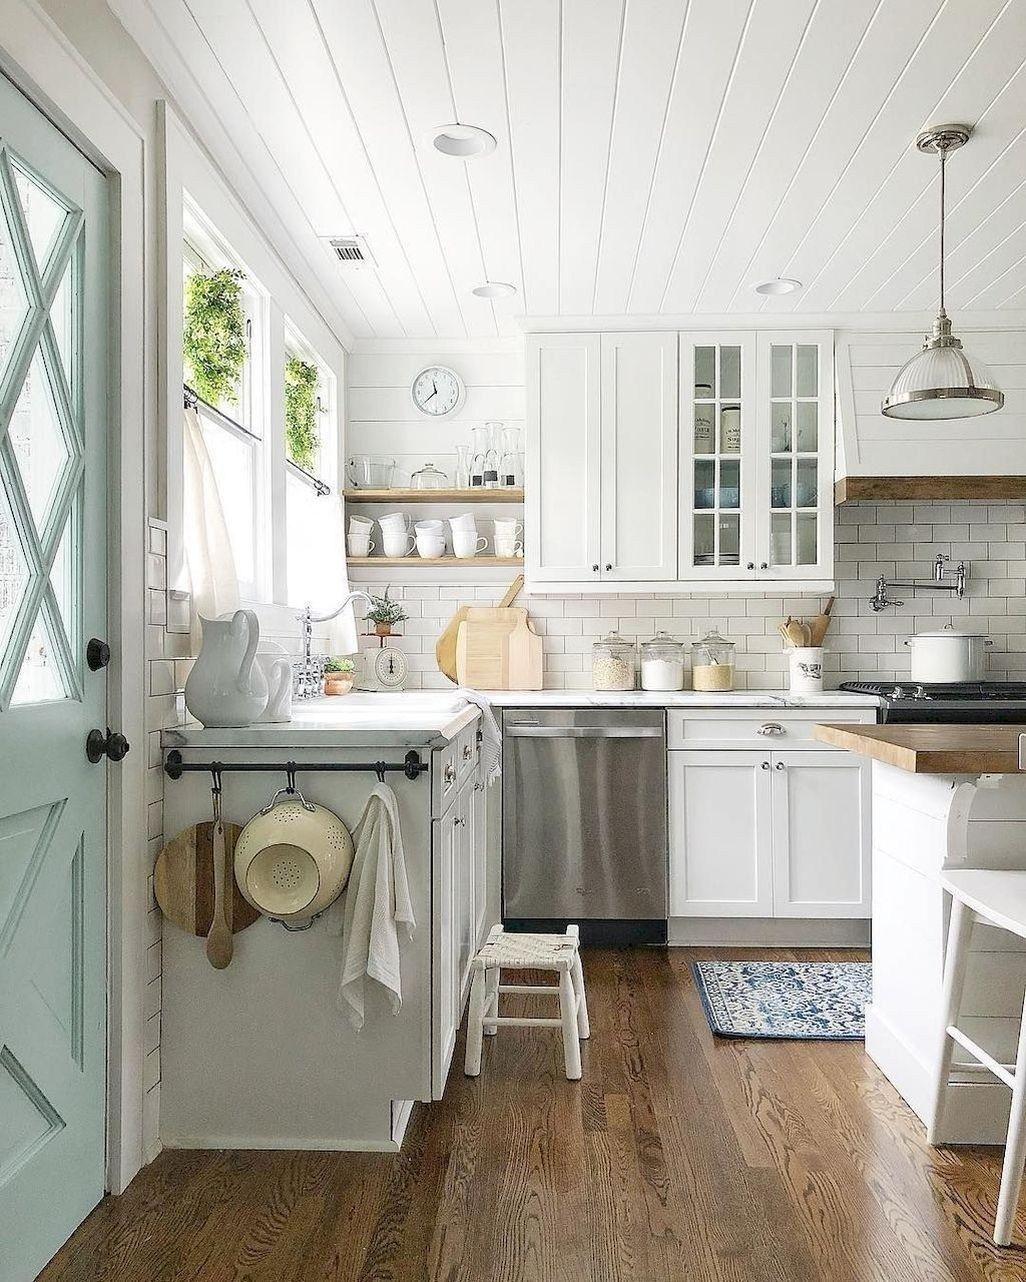 20 Charming Cottage Style Kitchen Decors: 40 Cute Farmhouse Kitchen Decor Ideas